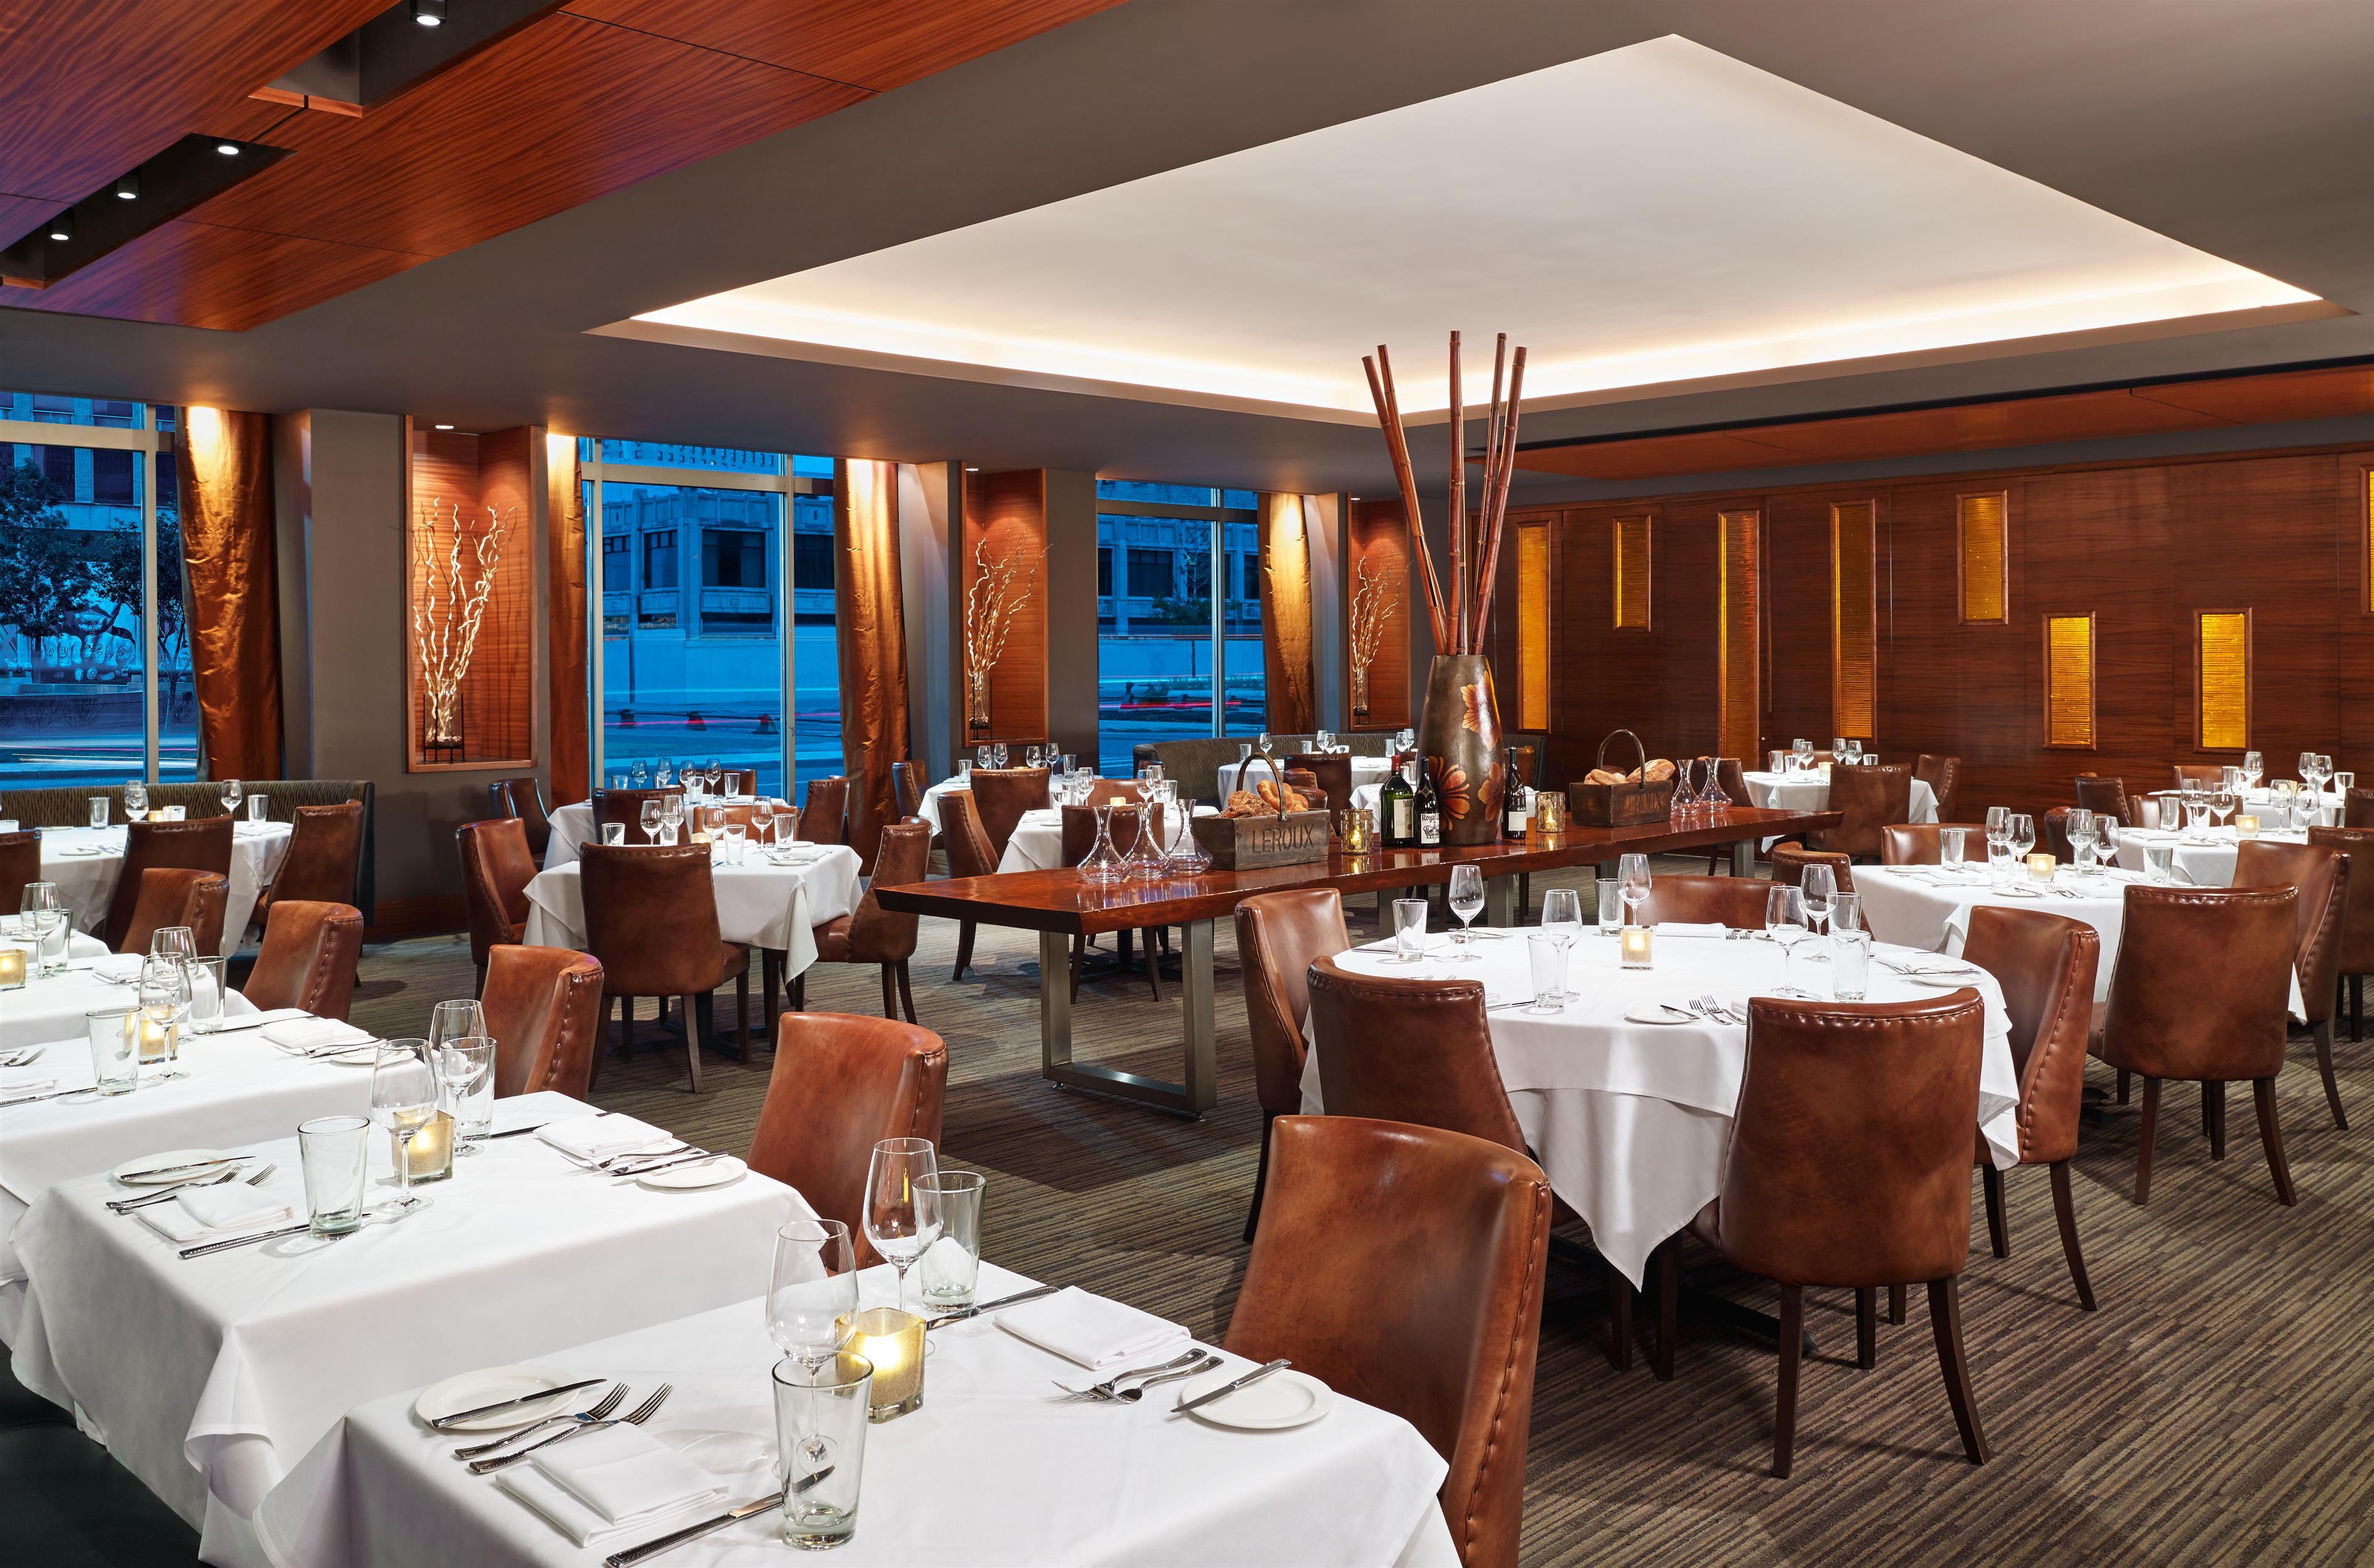 Michael Symon's ROAST Restaurant